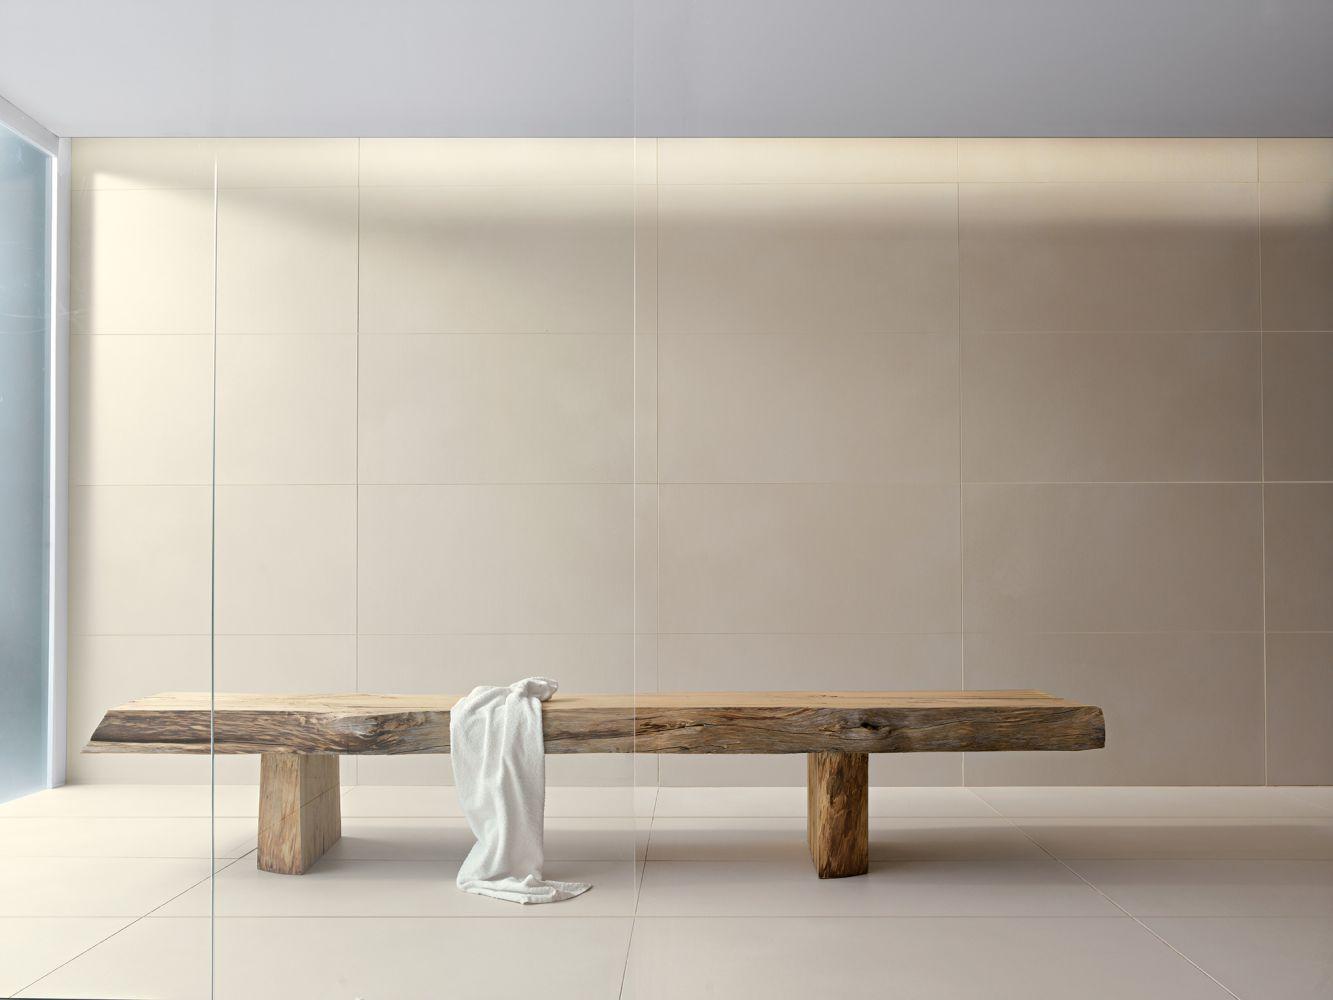 Indoor tile / living room / floor / wall - LINEN by Naoto Fukasawa ...